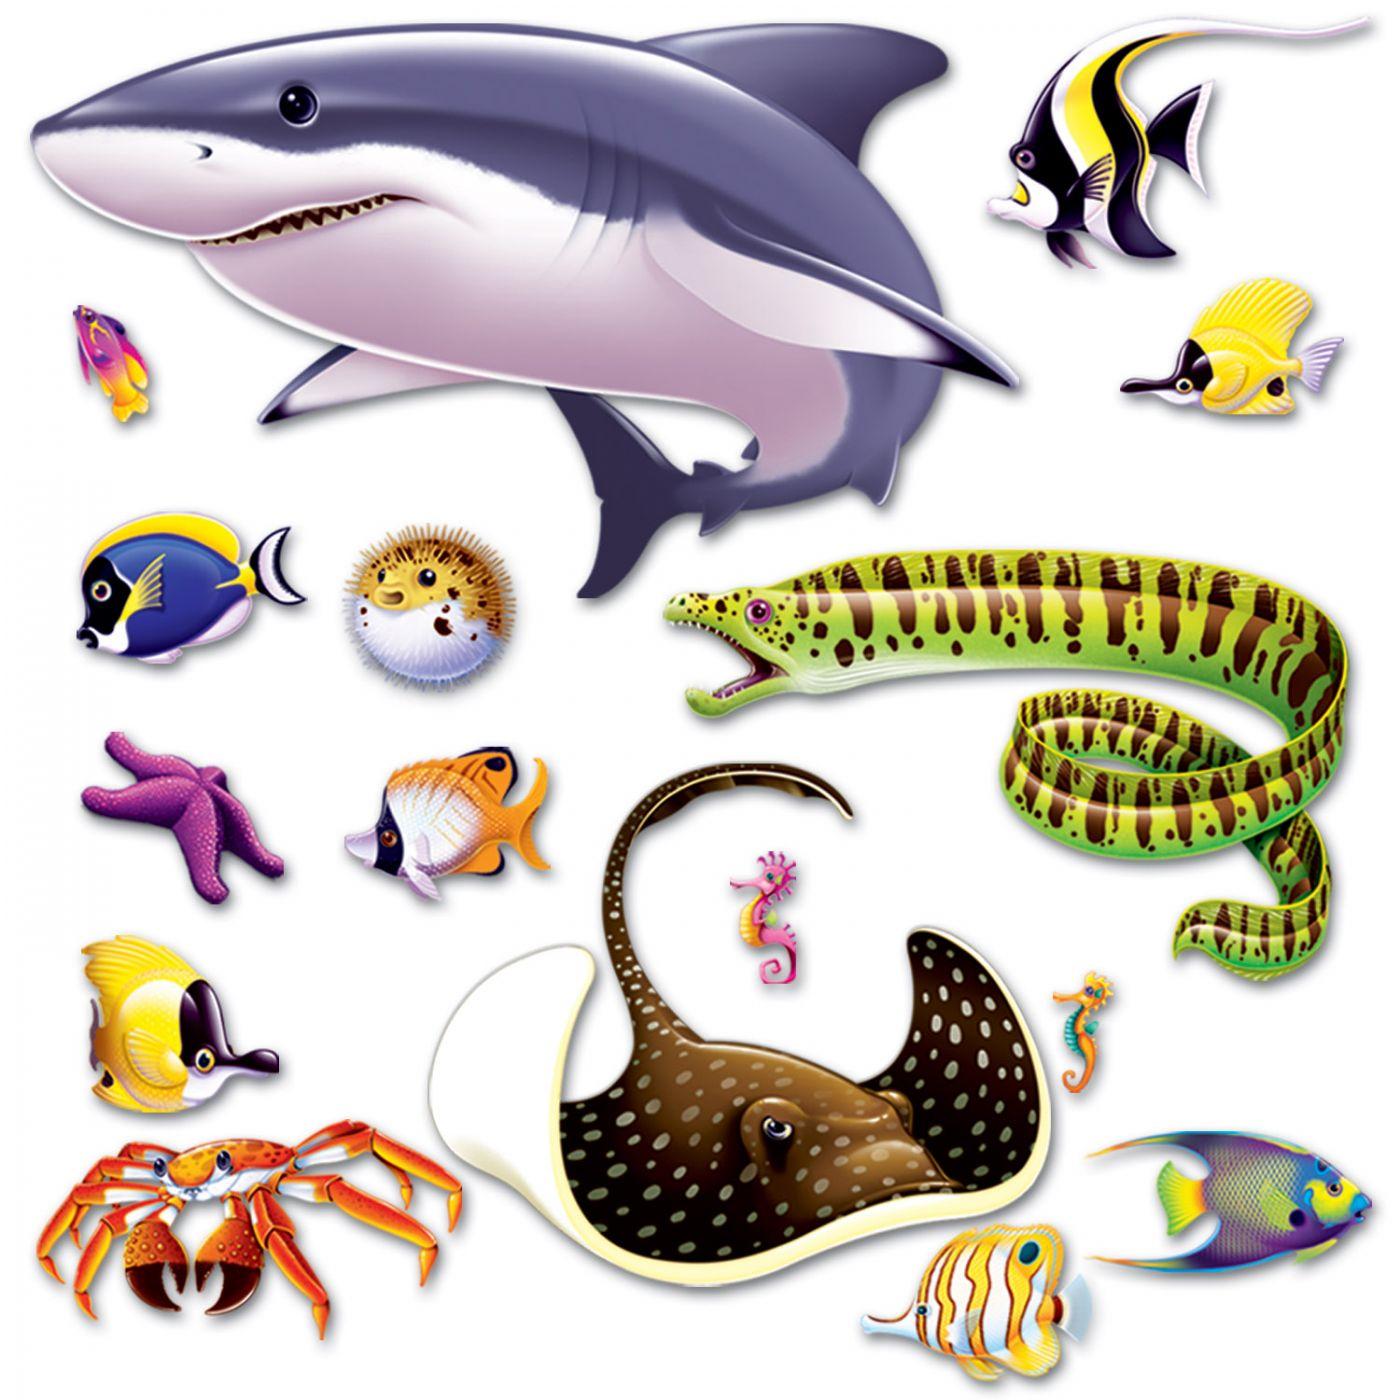 Marine Life Props image